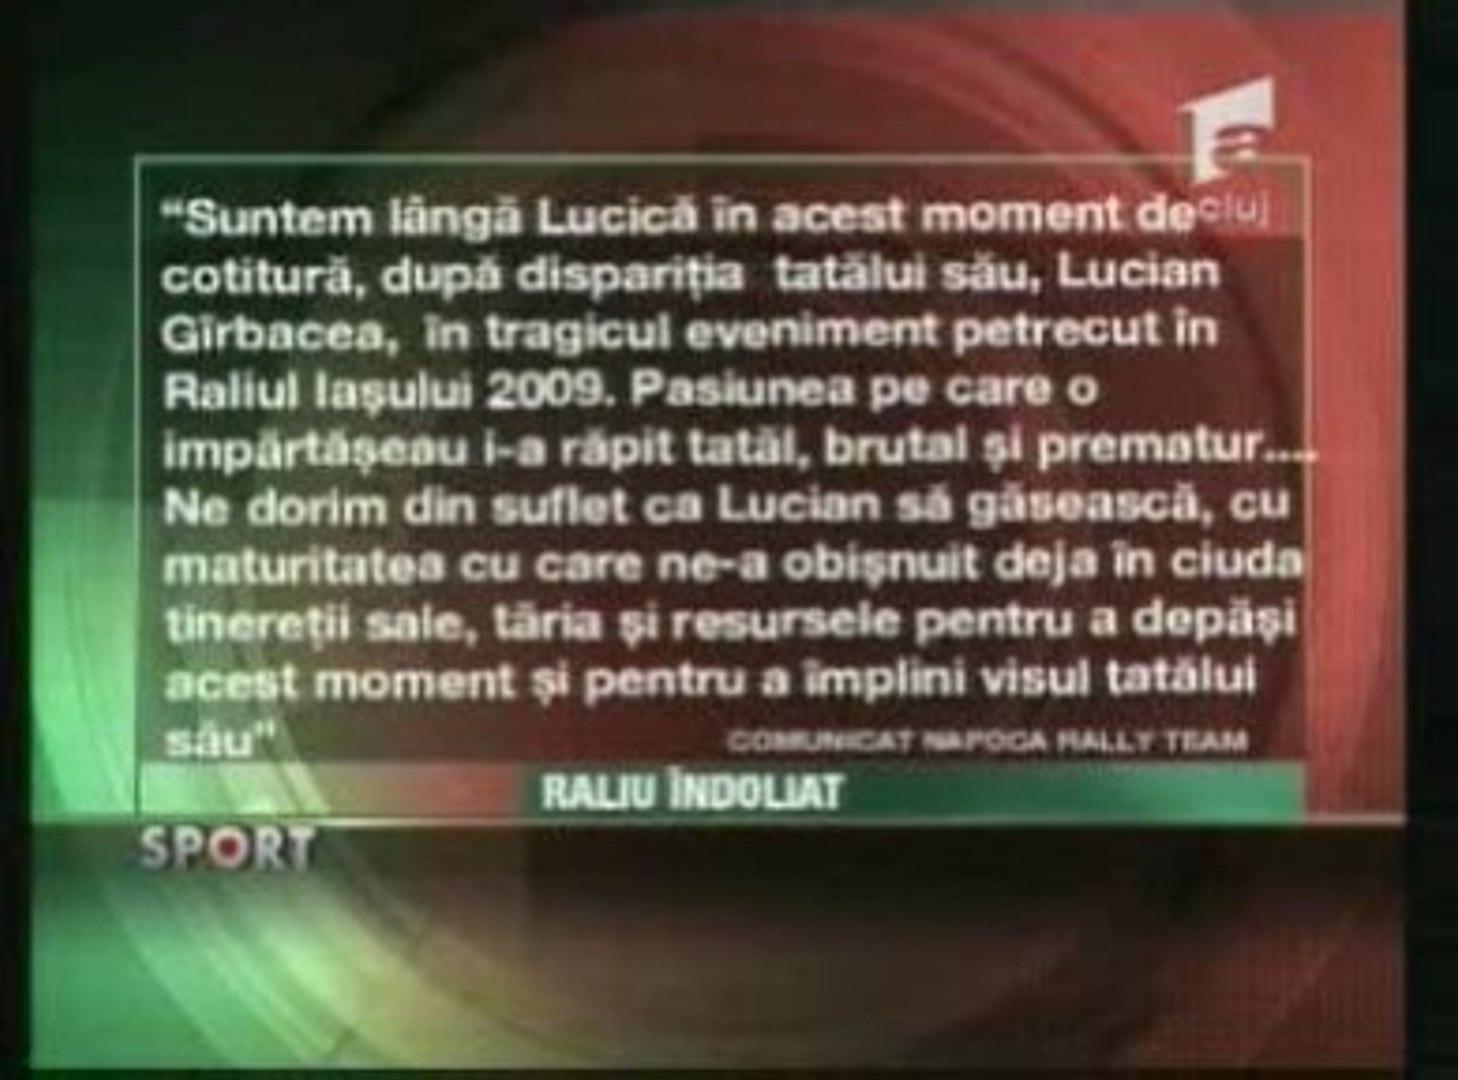 Sport - 26.05.2009